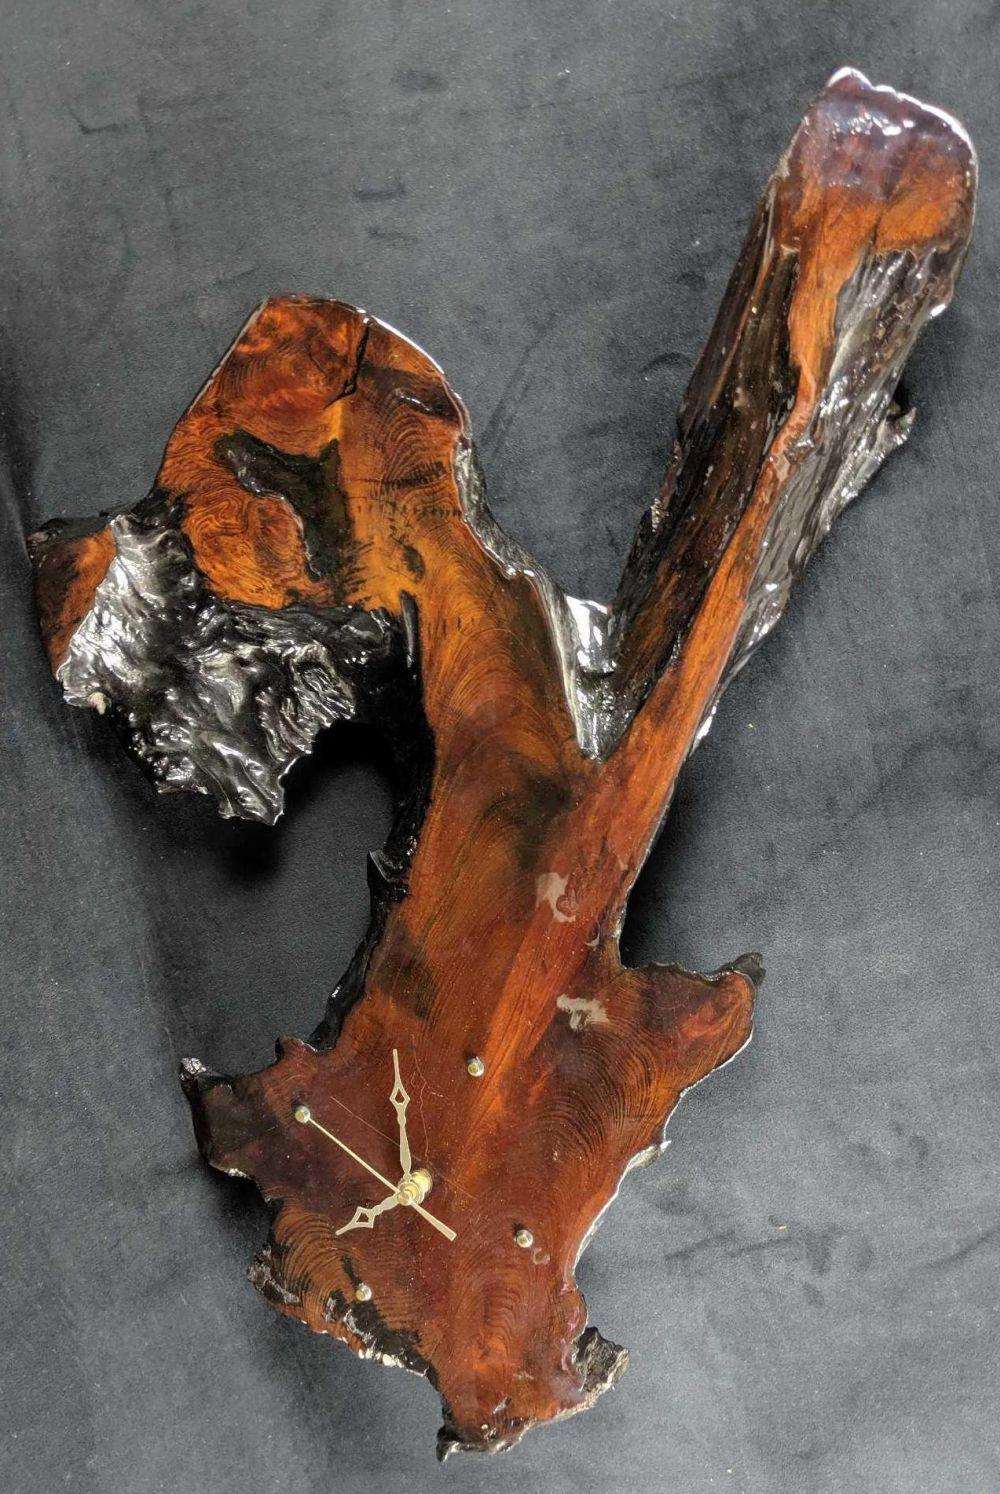 Lot 290: Unique Salavaged Decorative Redwood Handmade Clock